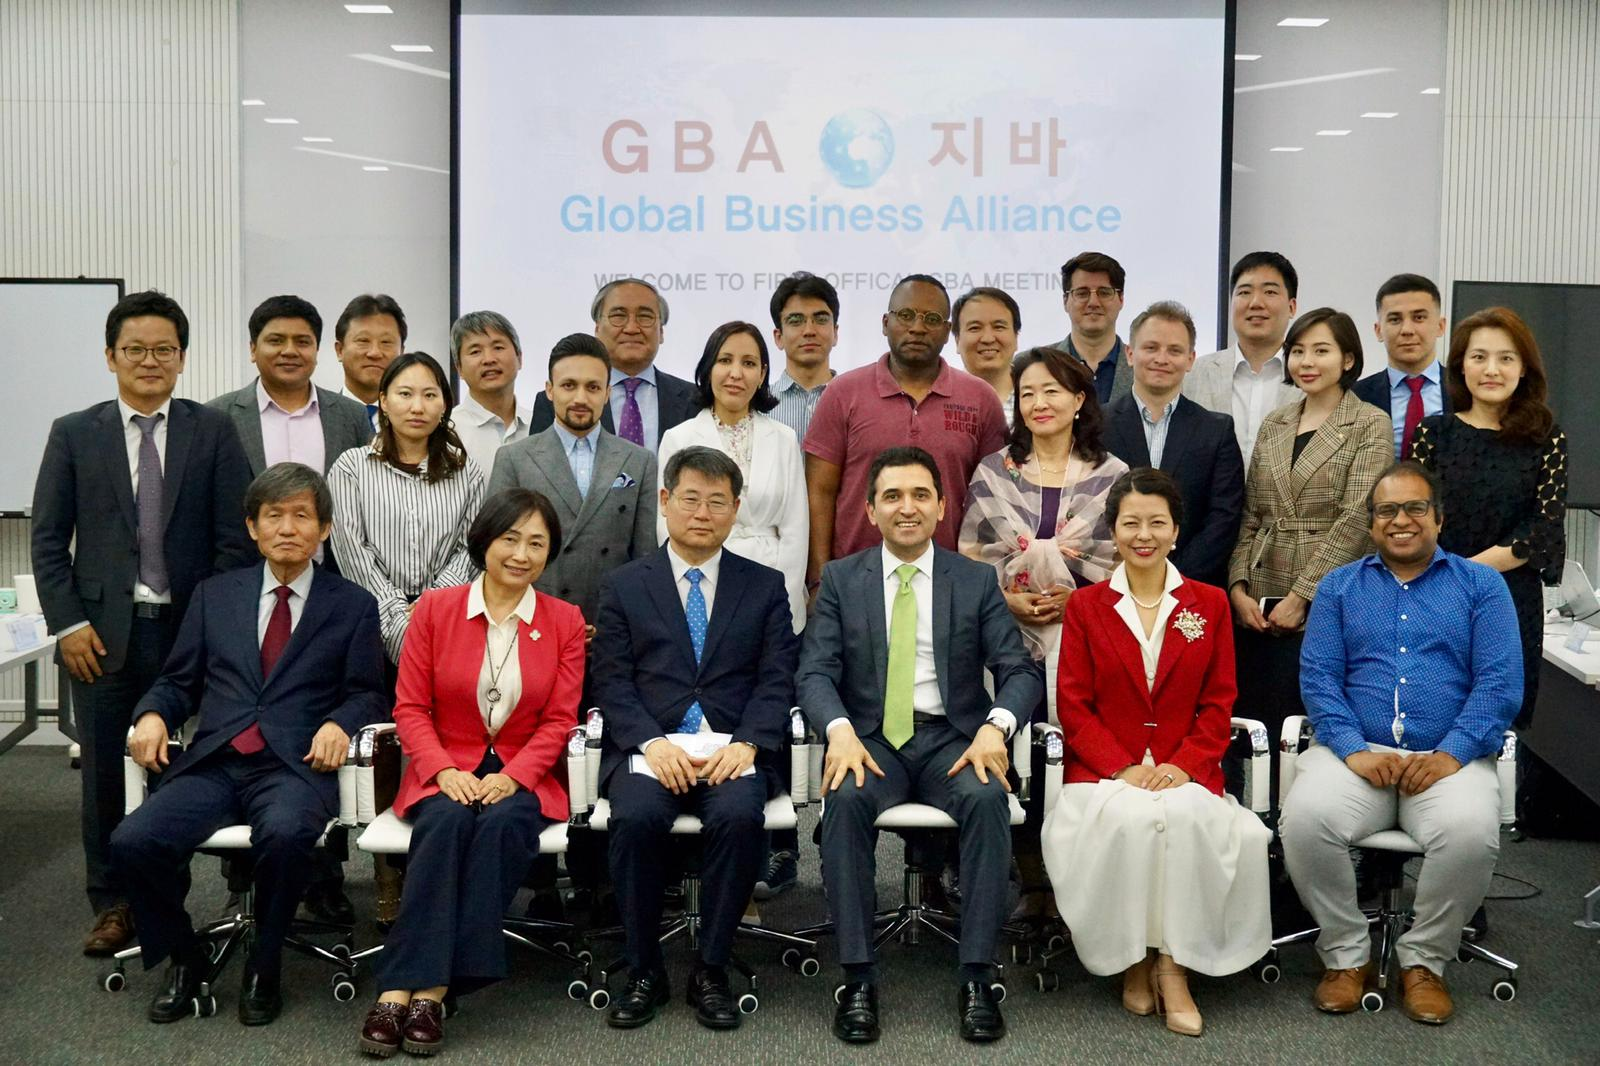 Global Business Alliance | GBA